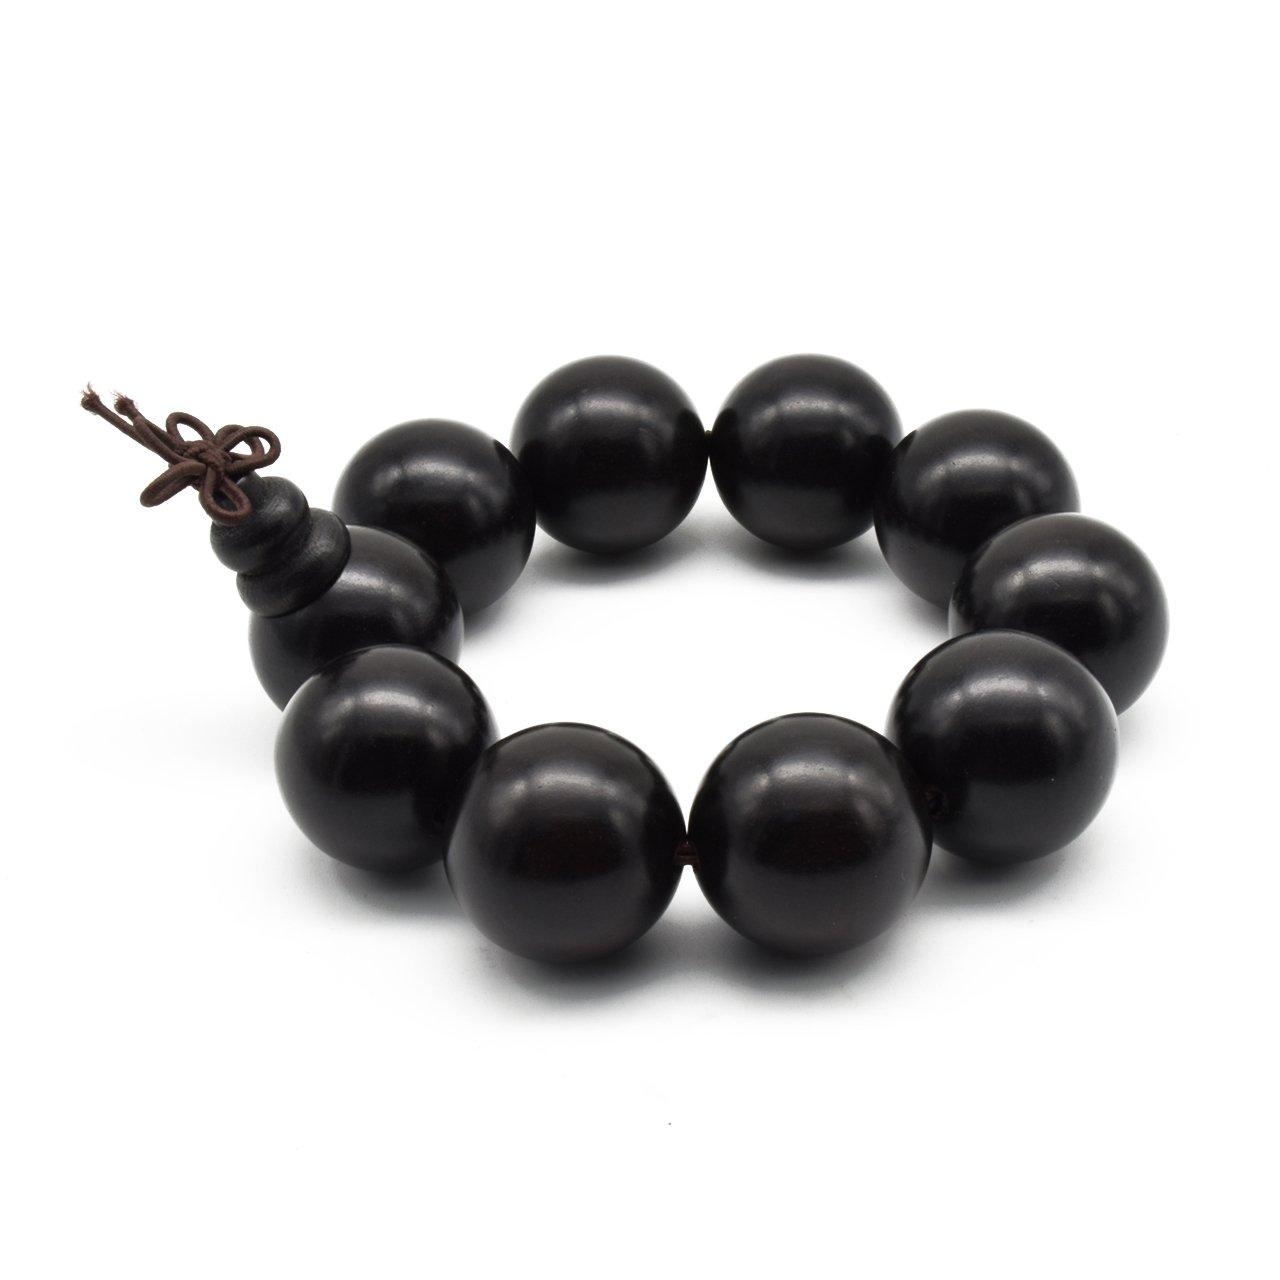 Zen Dear Unisex Natural Ebony Wood Buddhist Prayer Bead Necklace Bracelet Tibetan Prayer Mala Beaded Black (25mm 10beads)